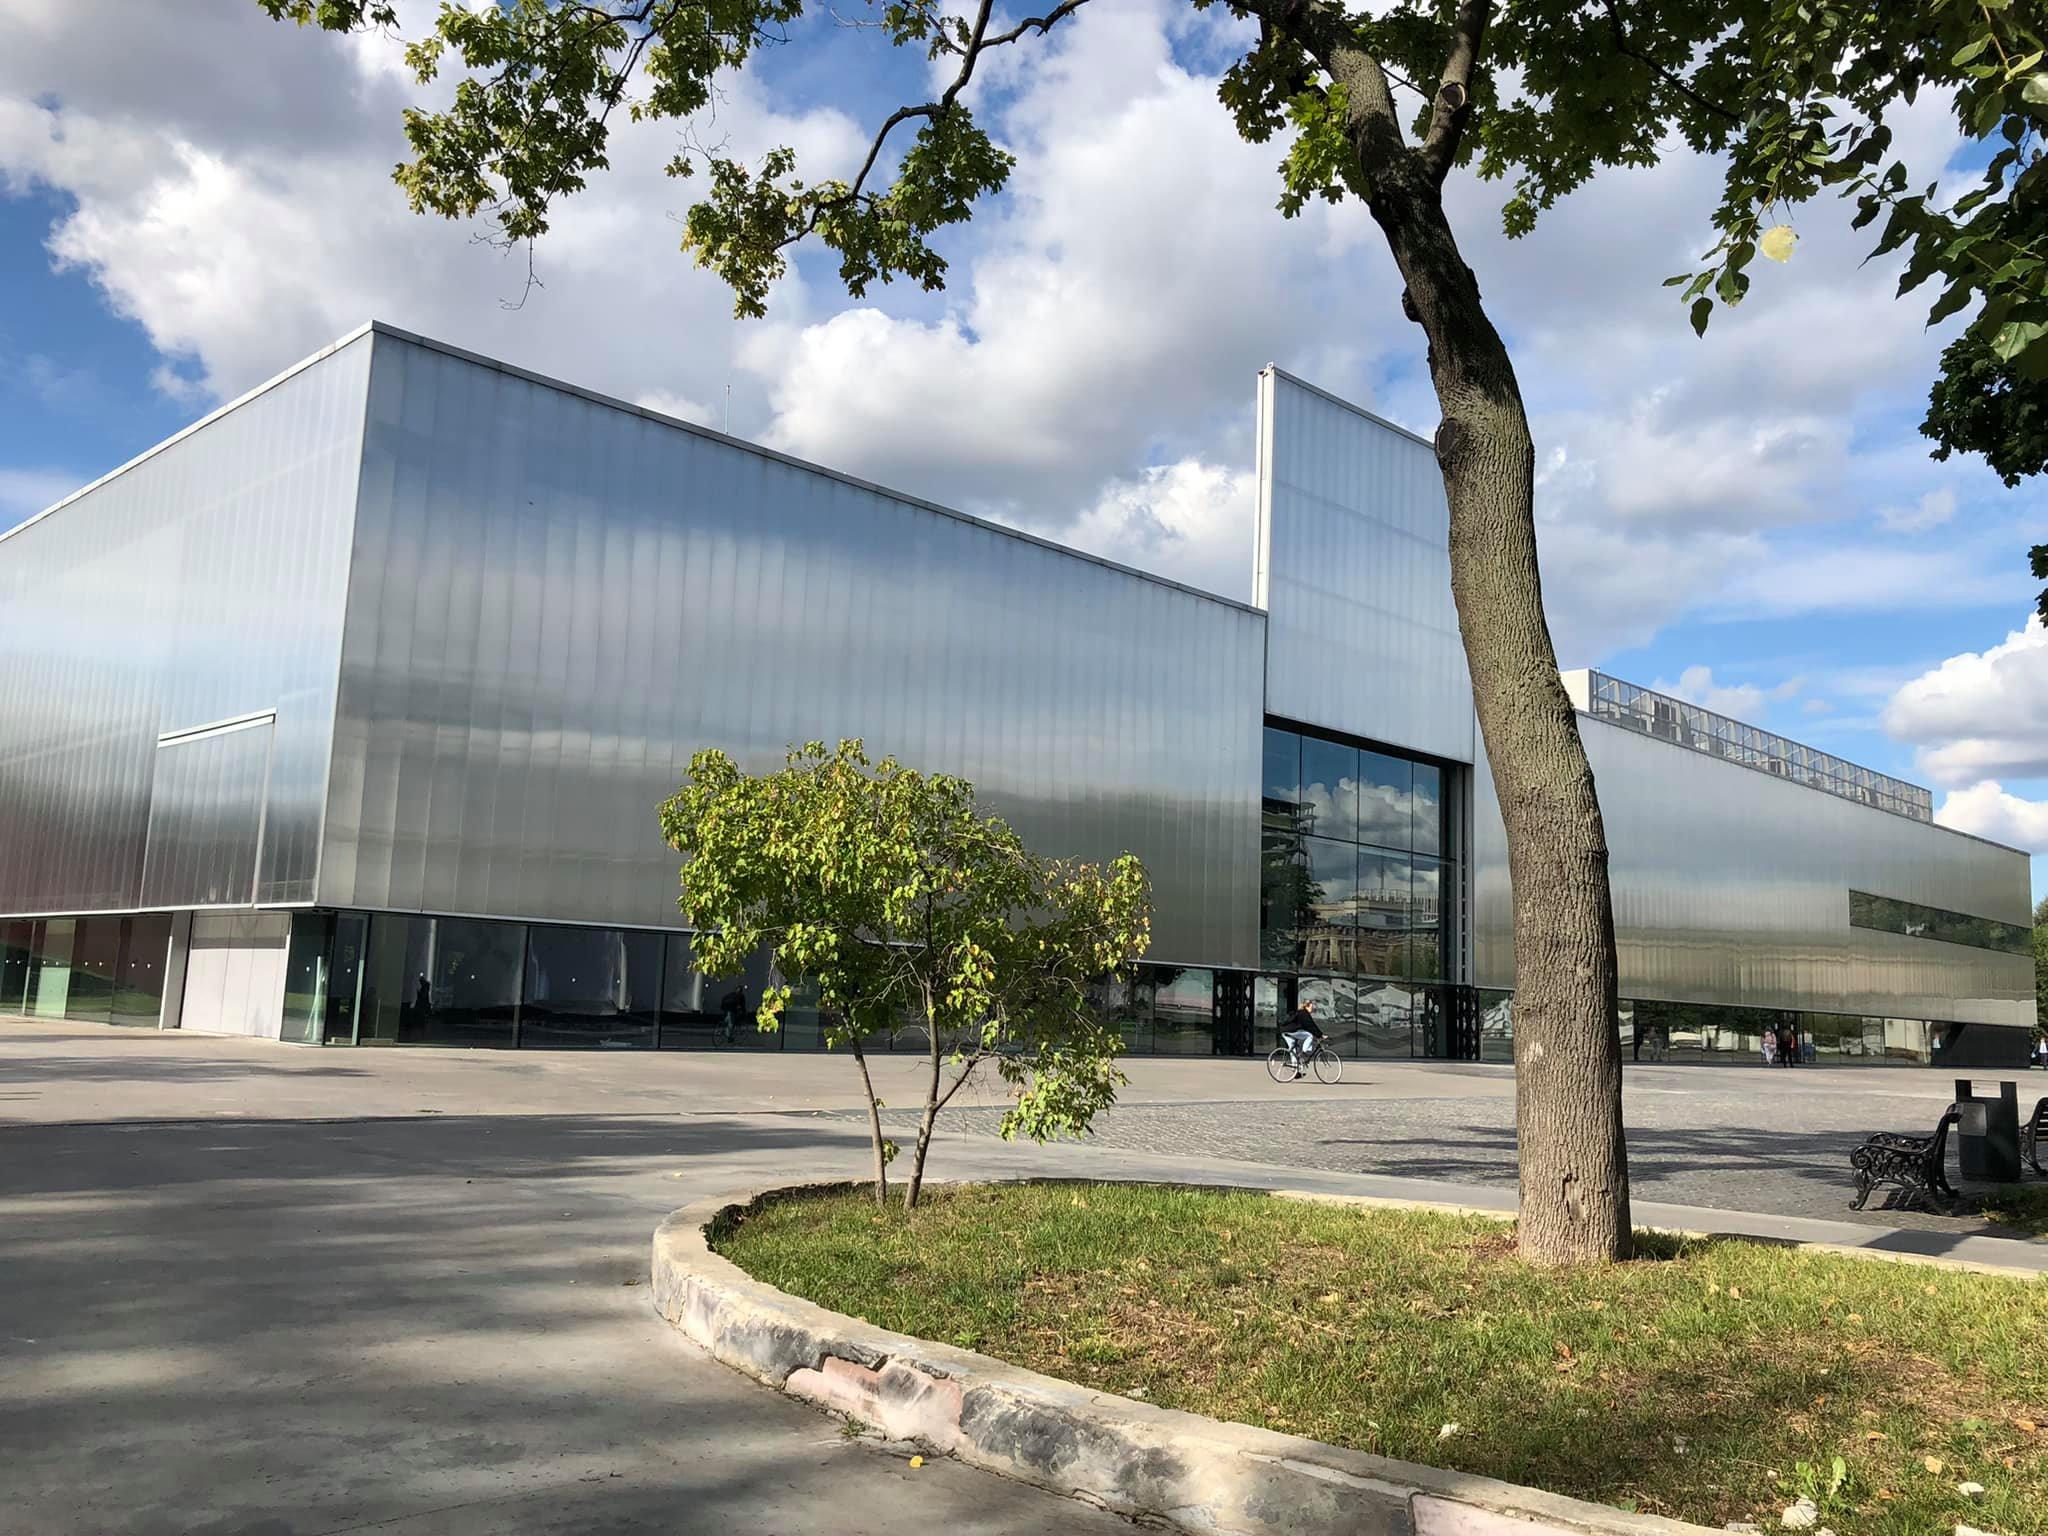 Garage Museum of Contemporary Art. В.Ахунов 2021